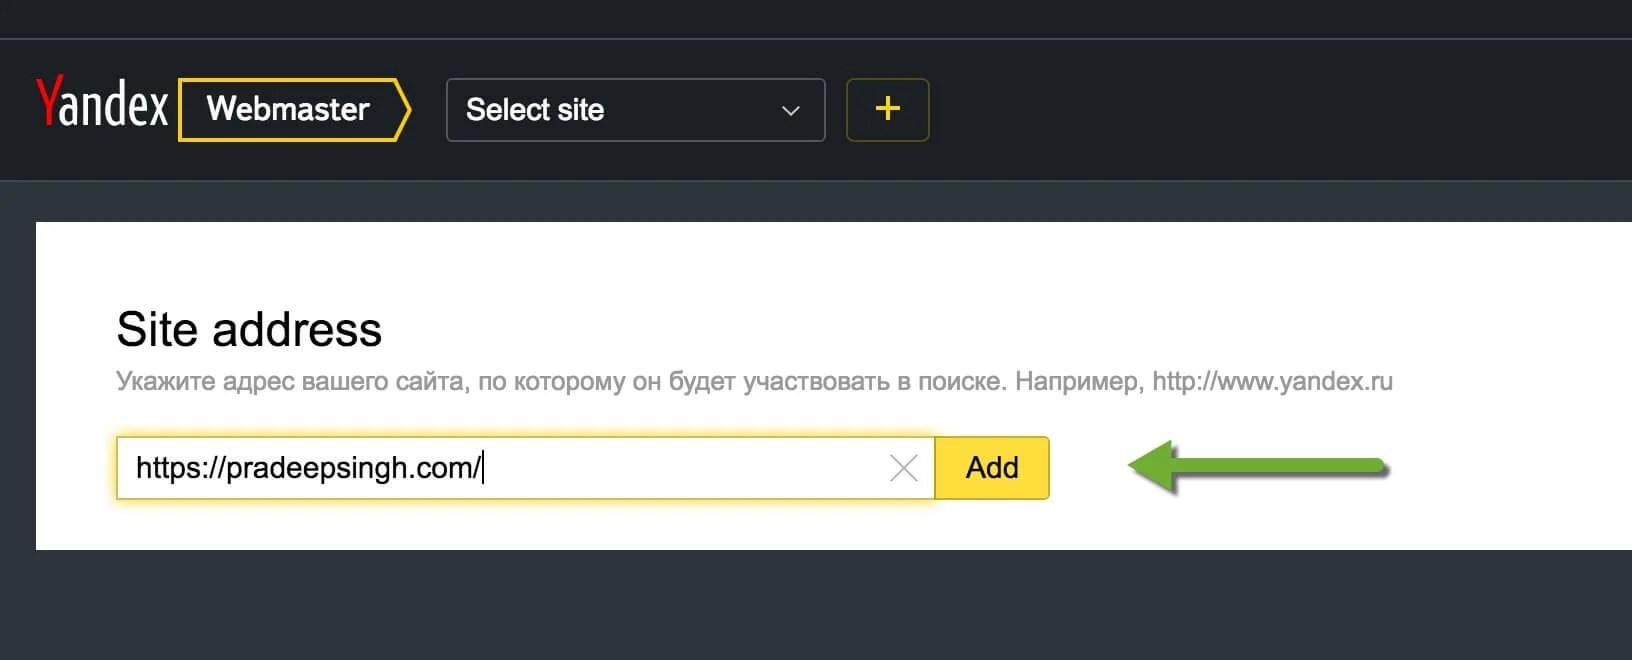 Add Site Address to Yandex Webmasters tool